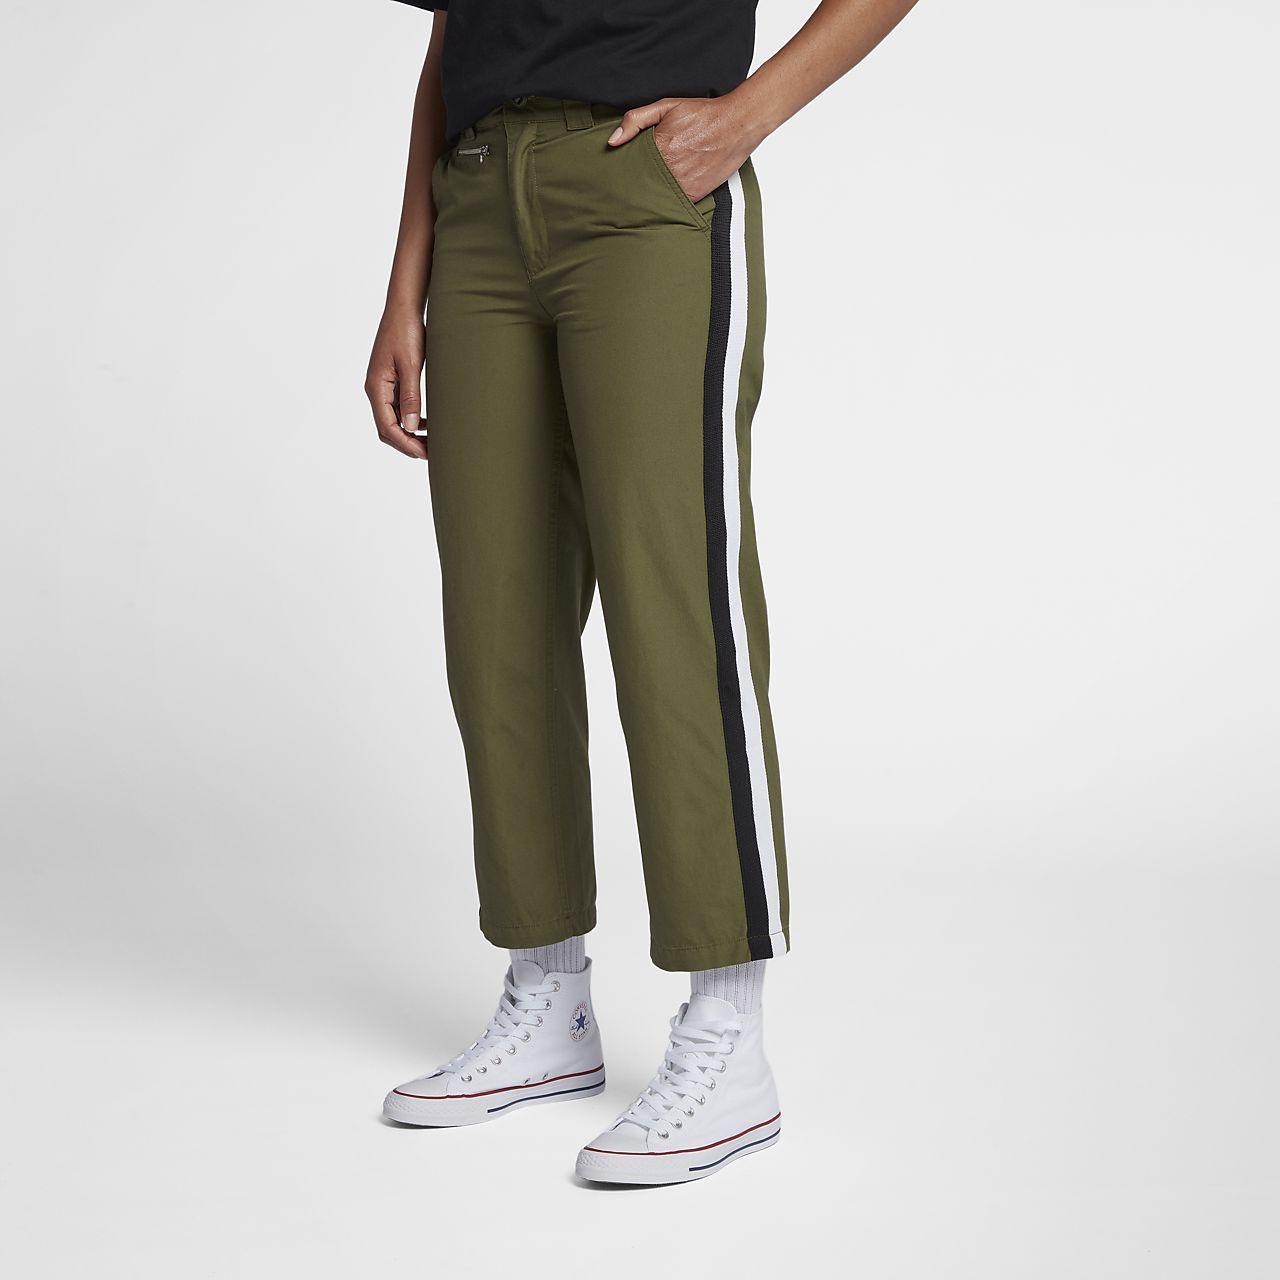 Converse Woven Women's Pants